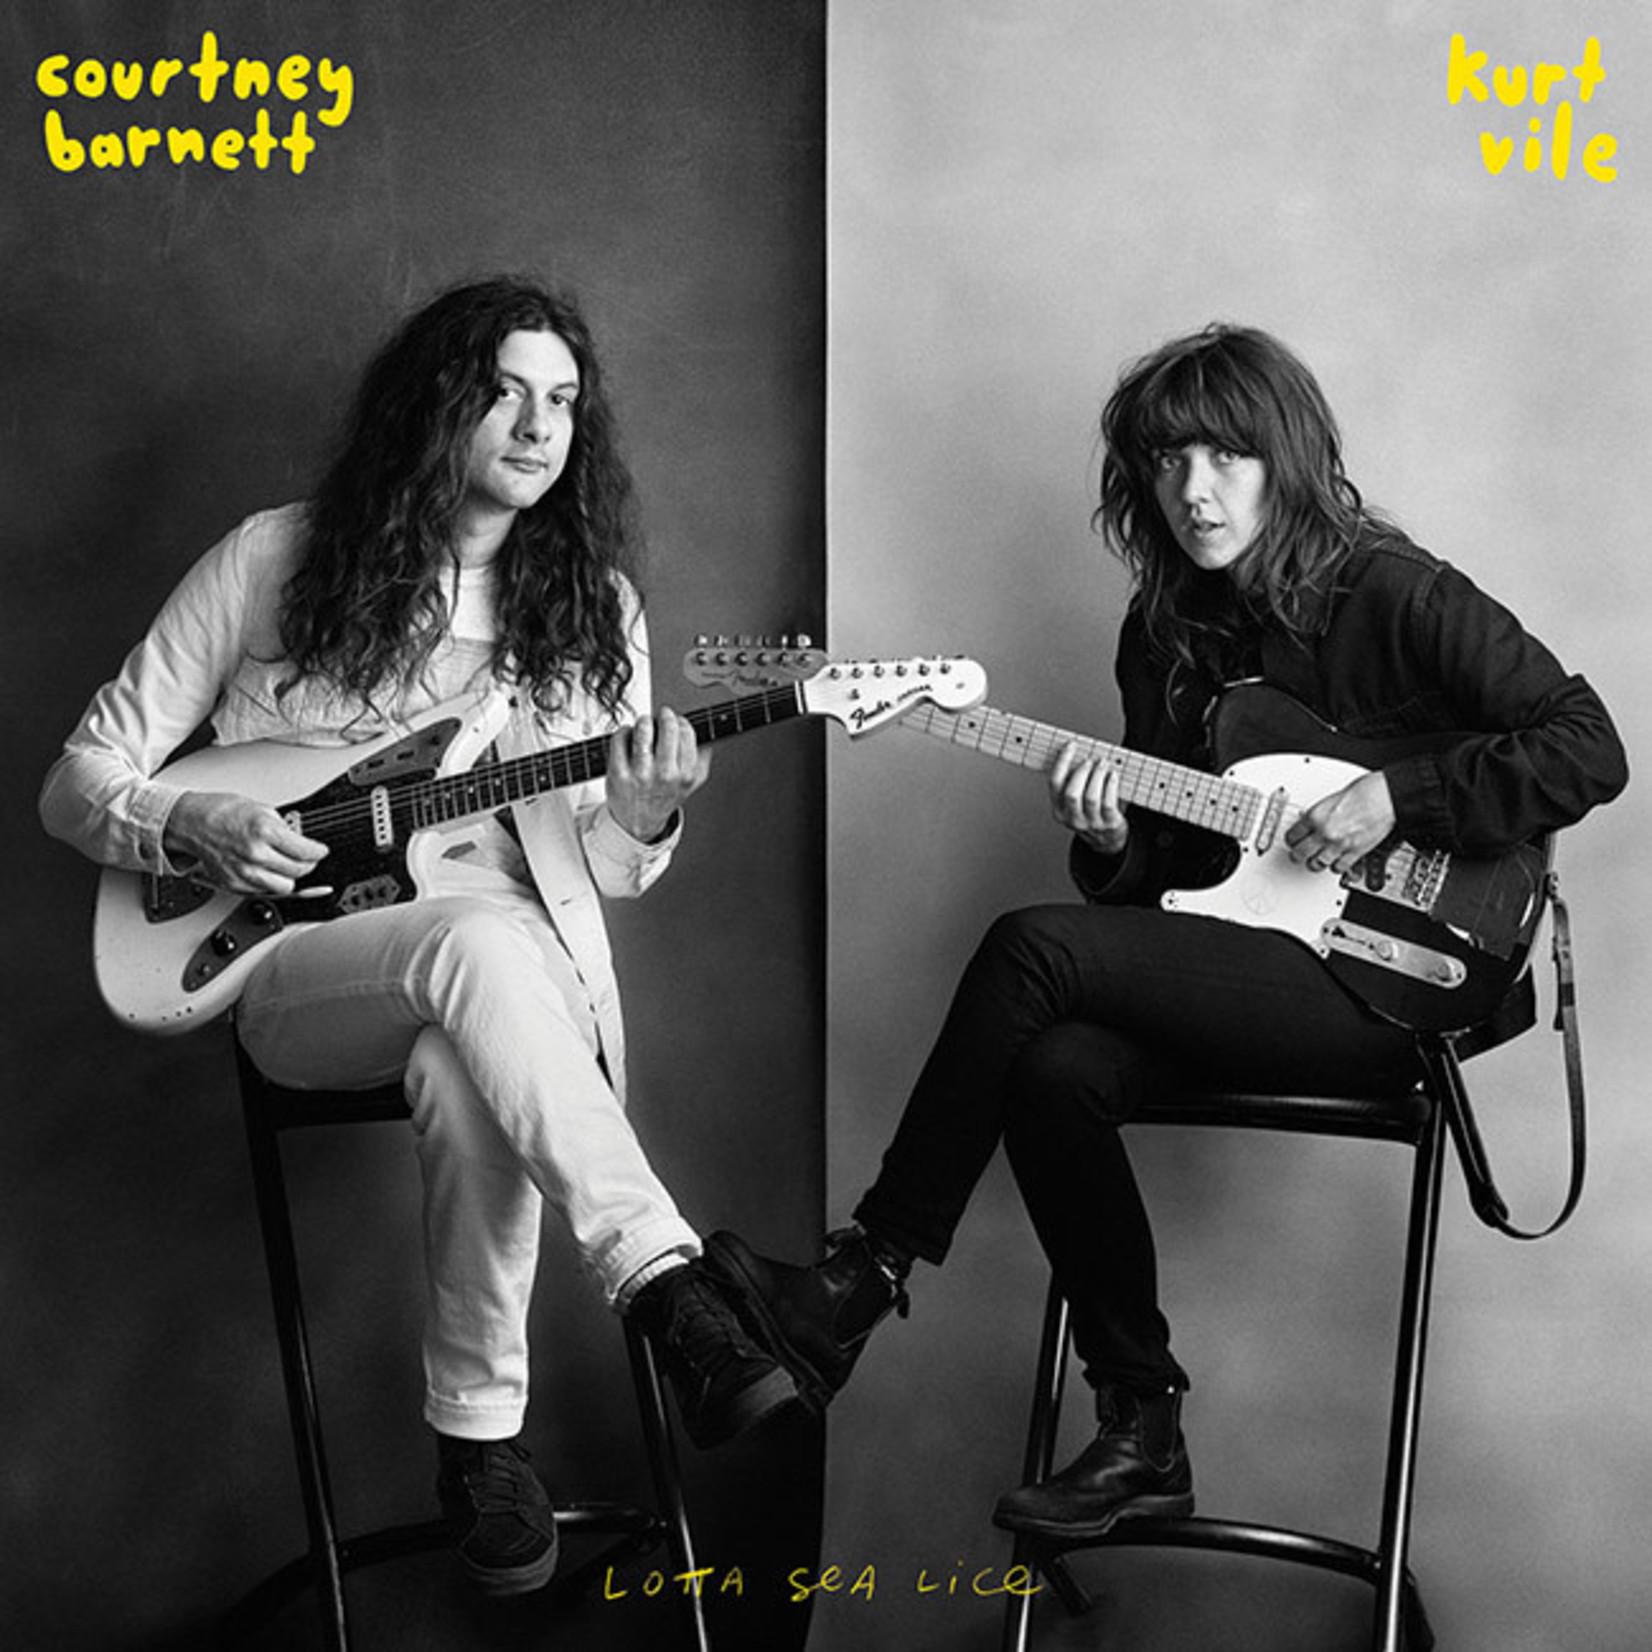 [New] Barnett, Courtney & Kurt Vile: Lotta Sea Lice